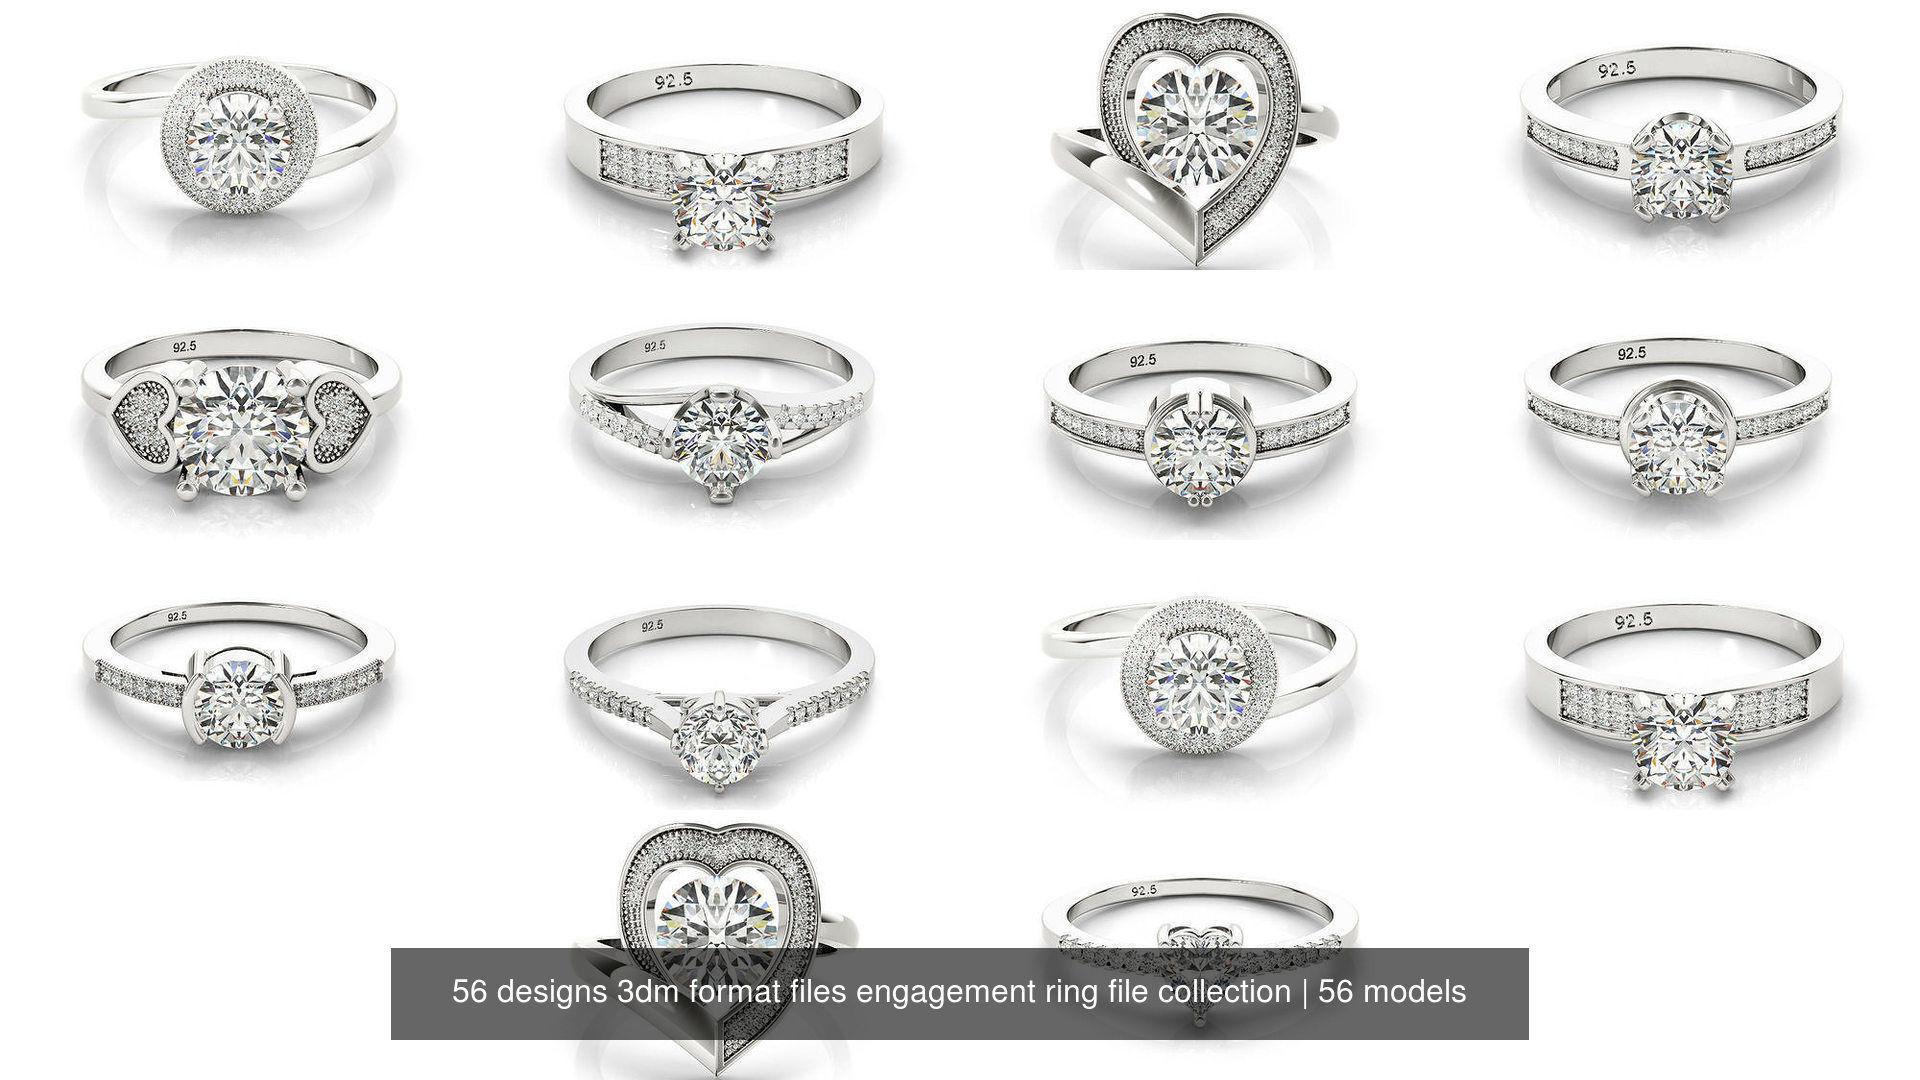 56 designs 3dm format files engagement ring file